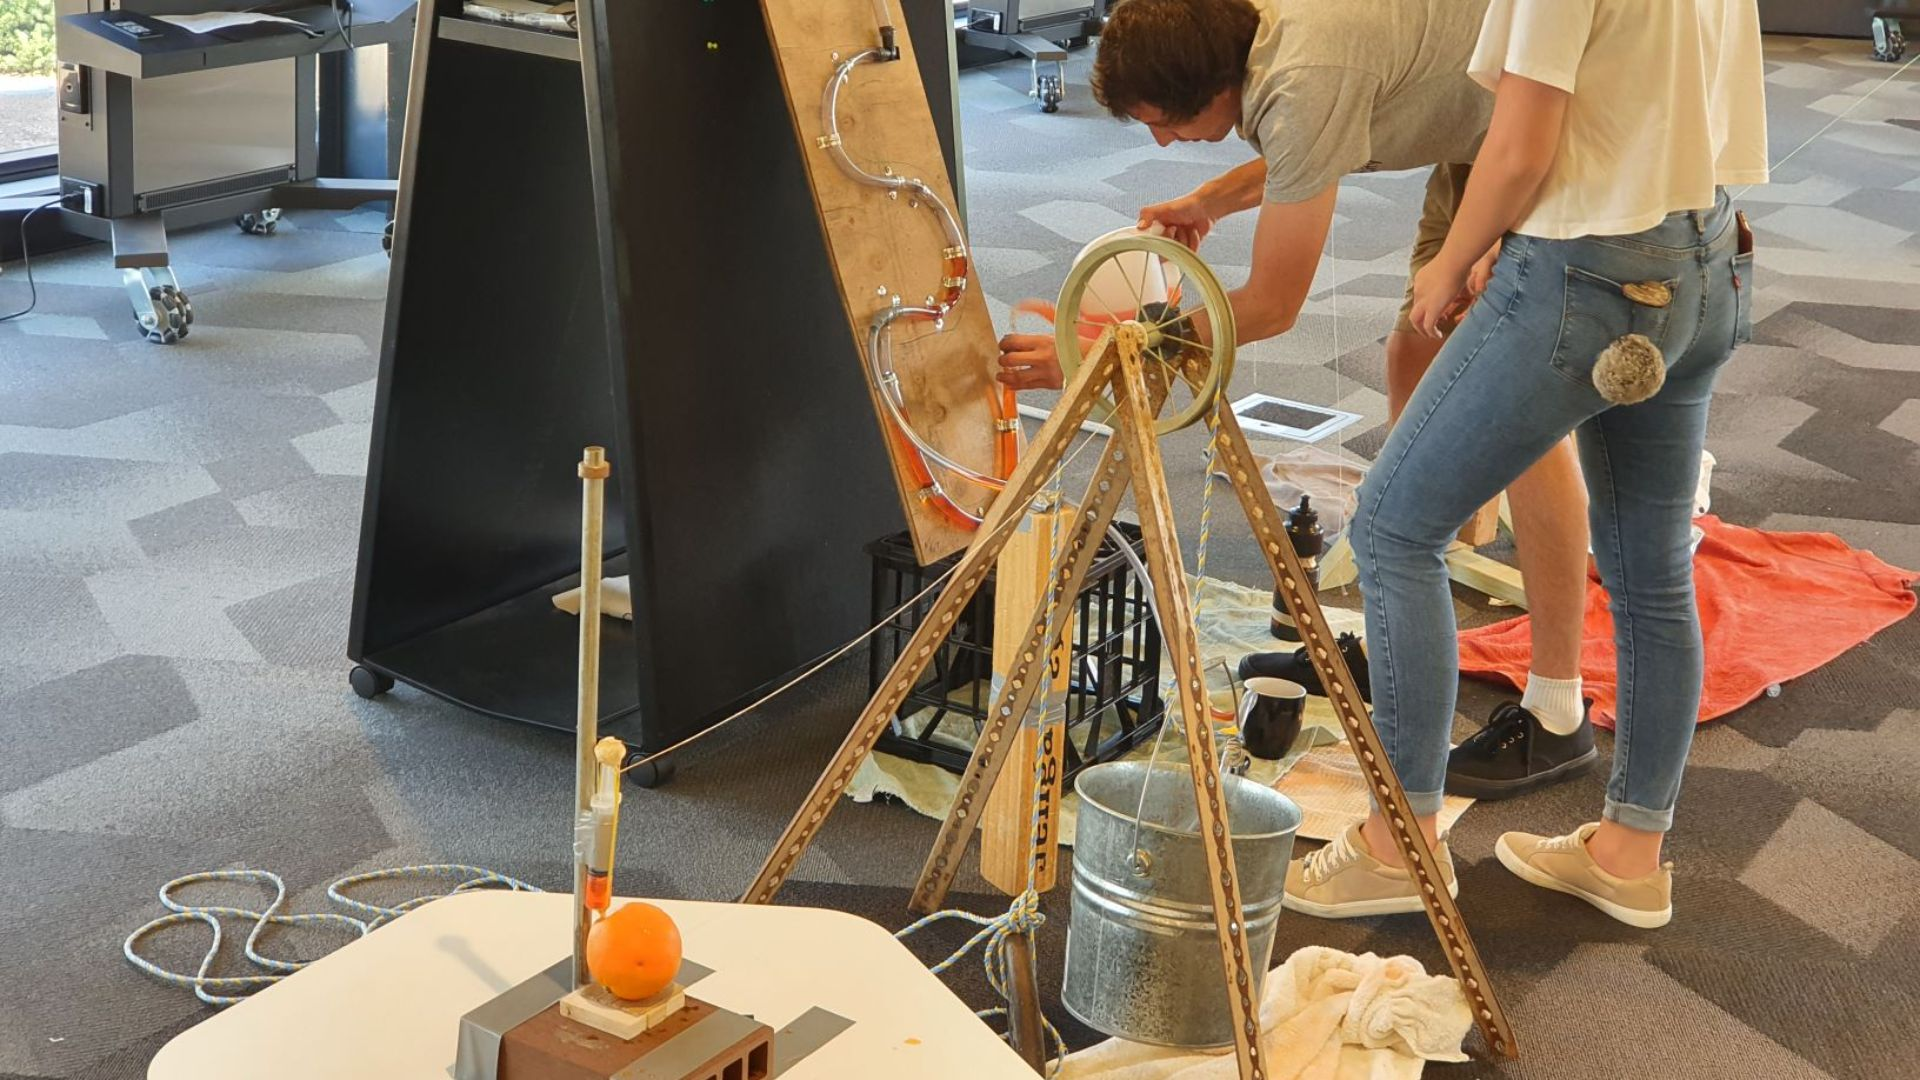 Annual Rube Goldberg Machine ran on time